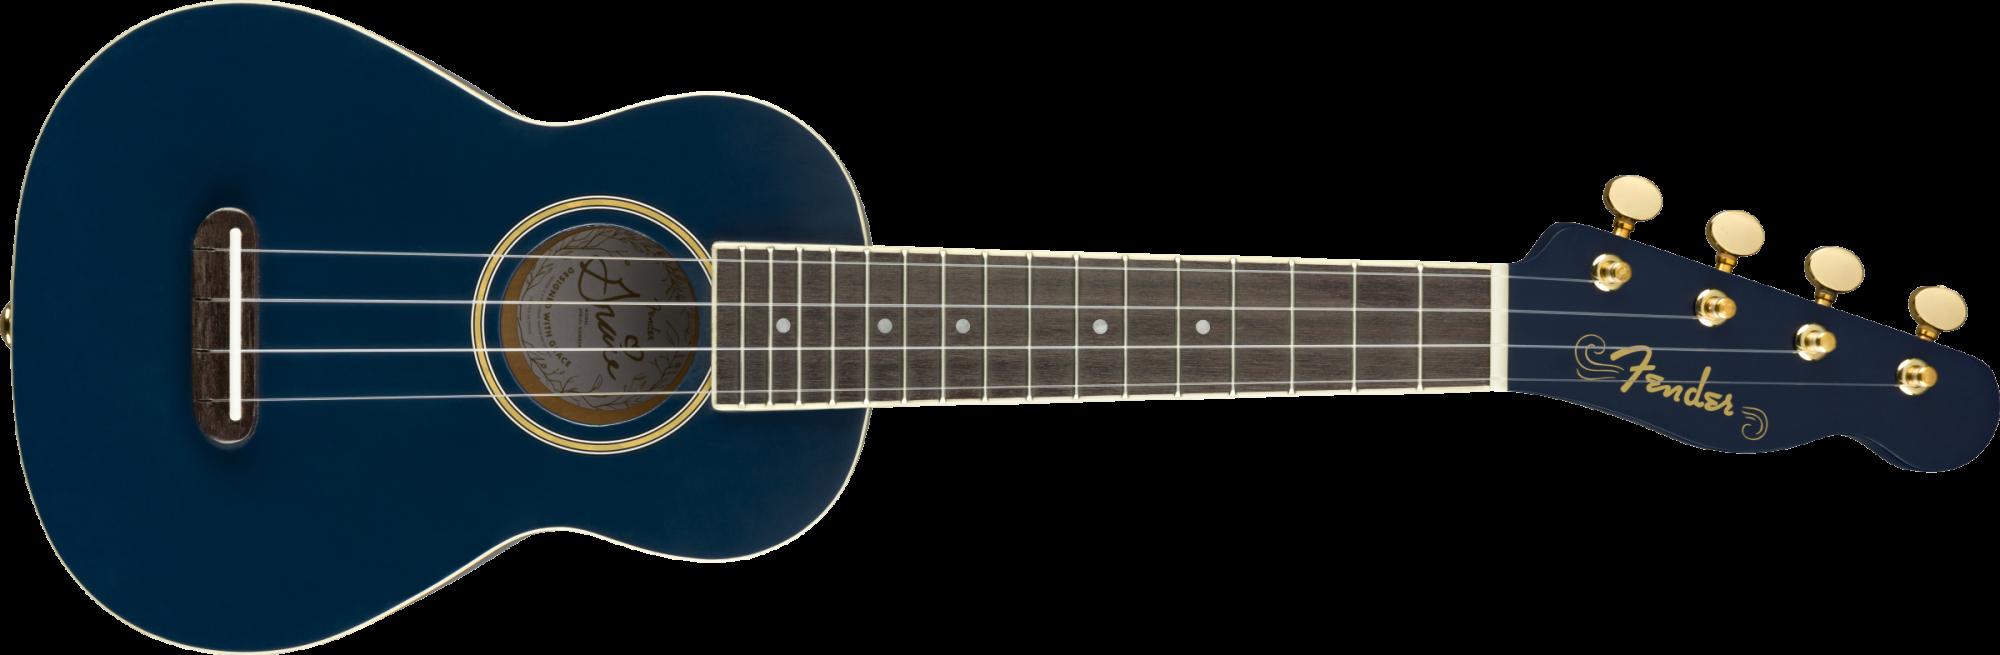 Fender Grace VanderWaal Moonlight Ukulele Soprano